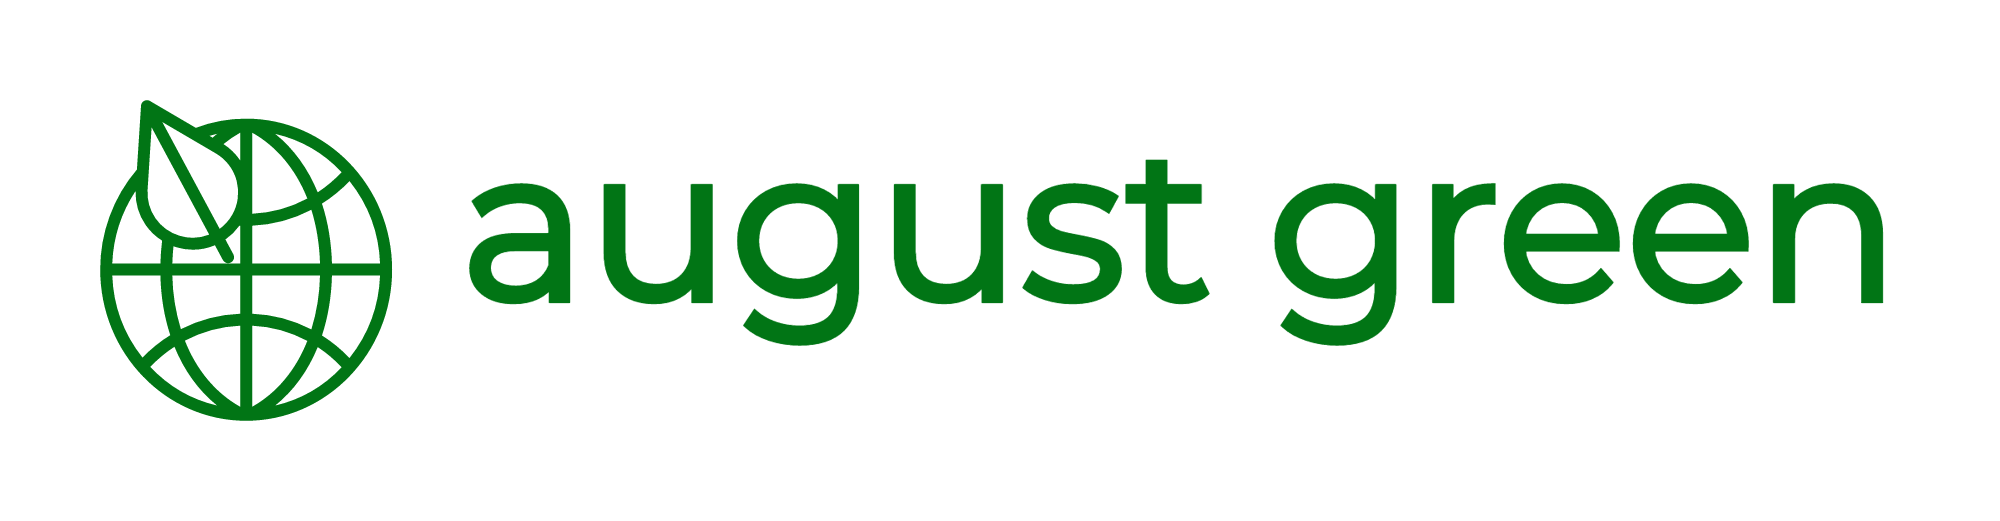 august green